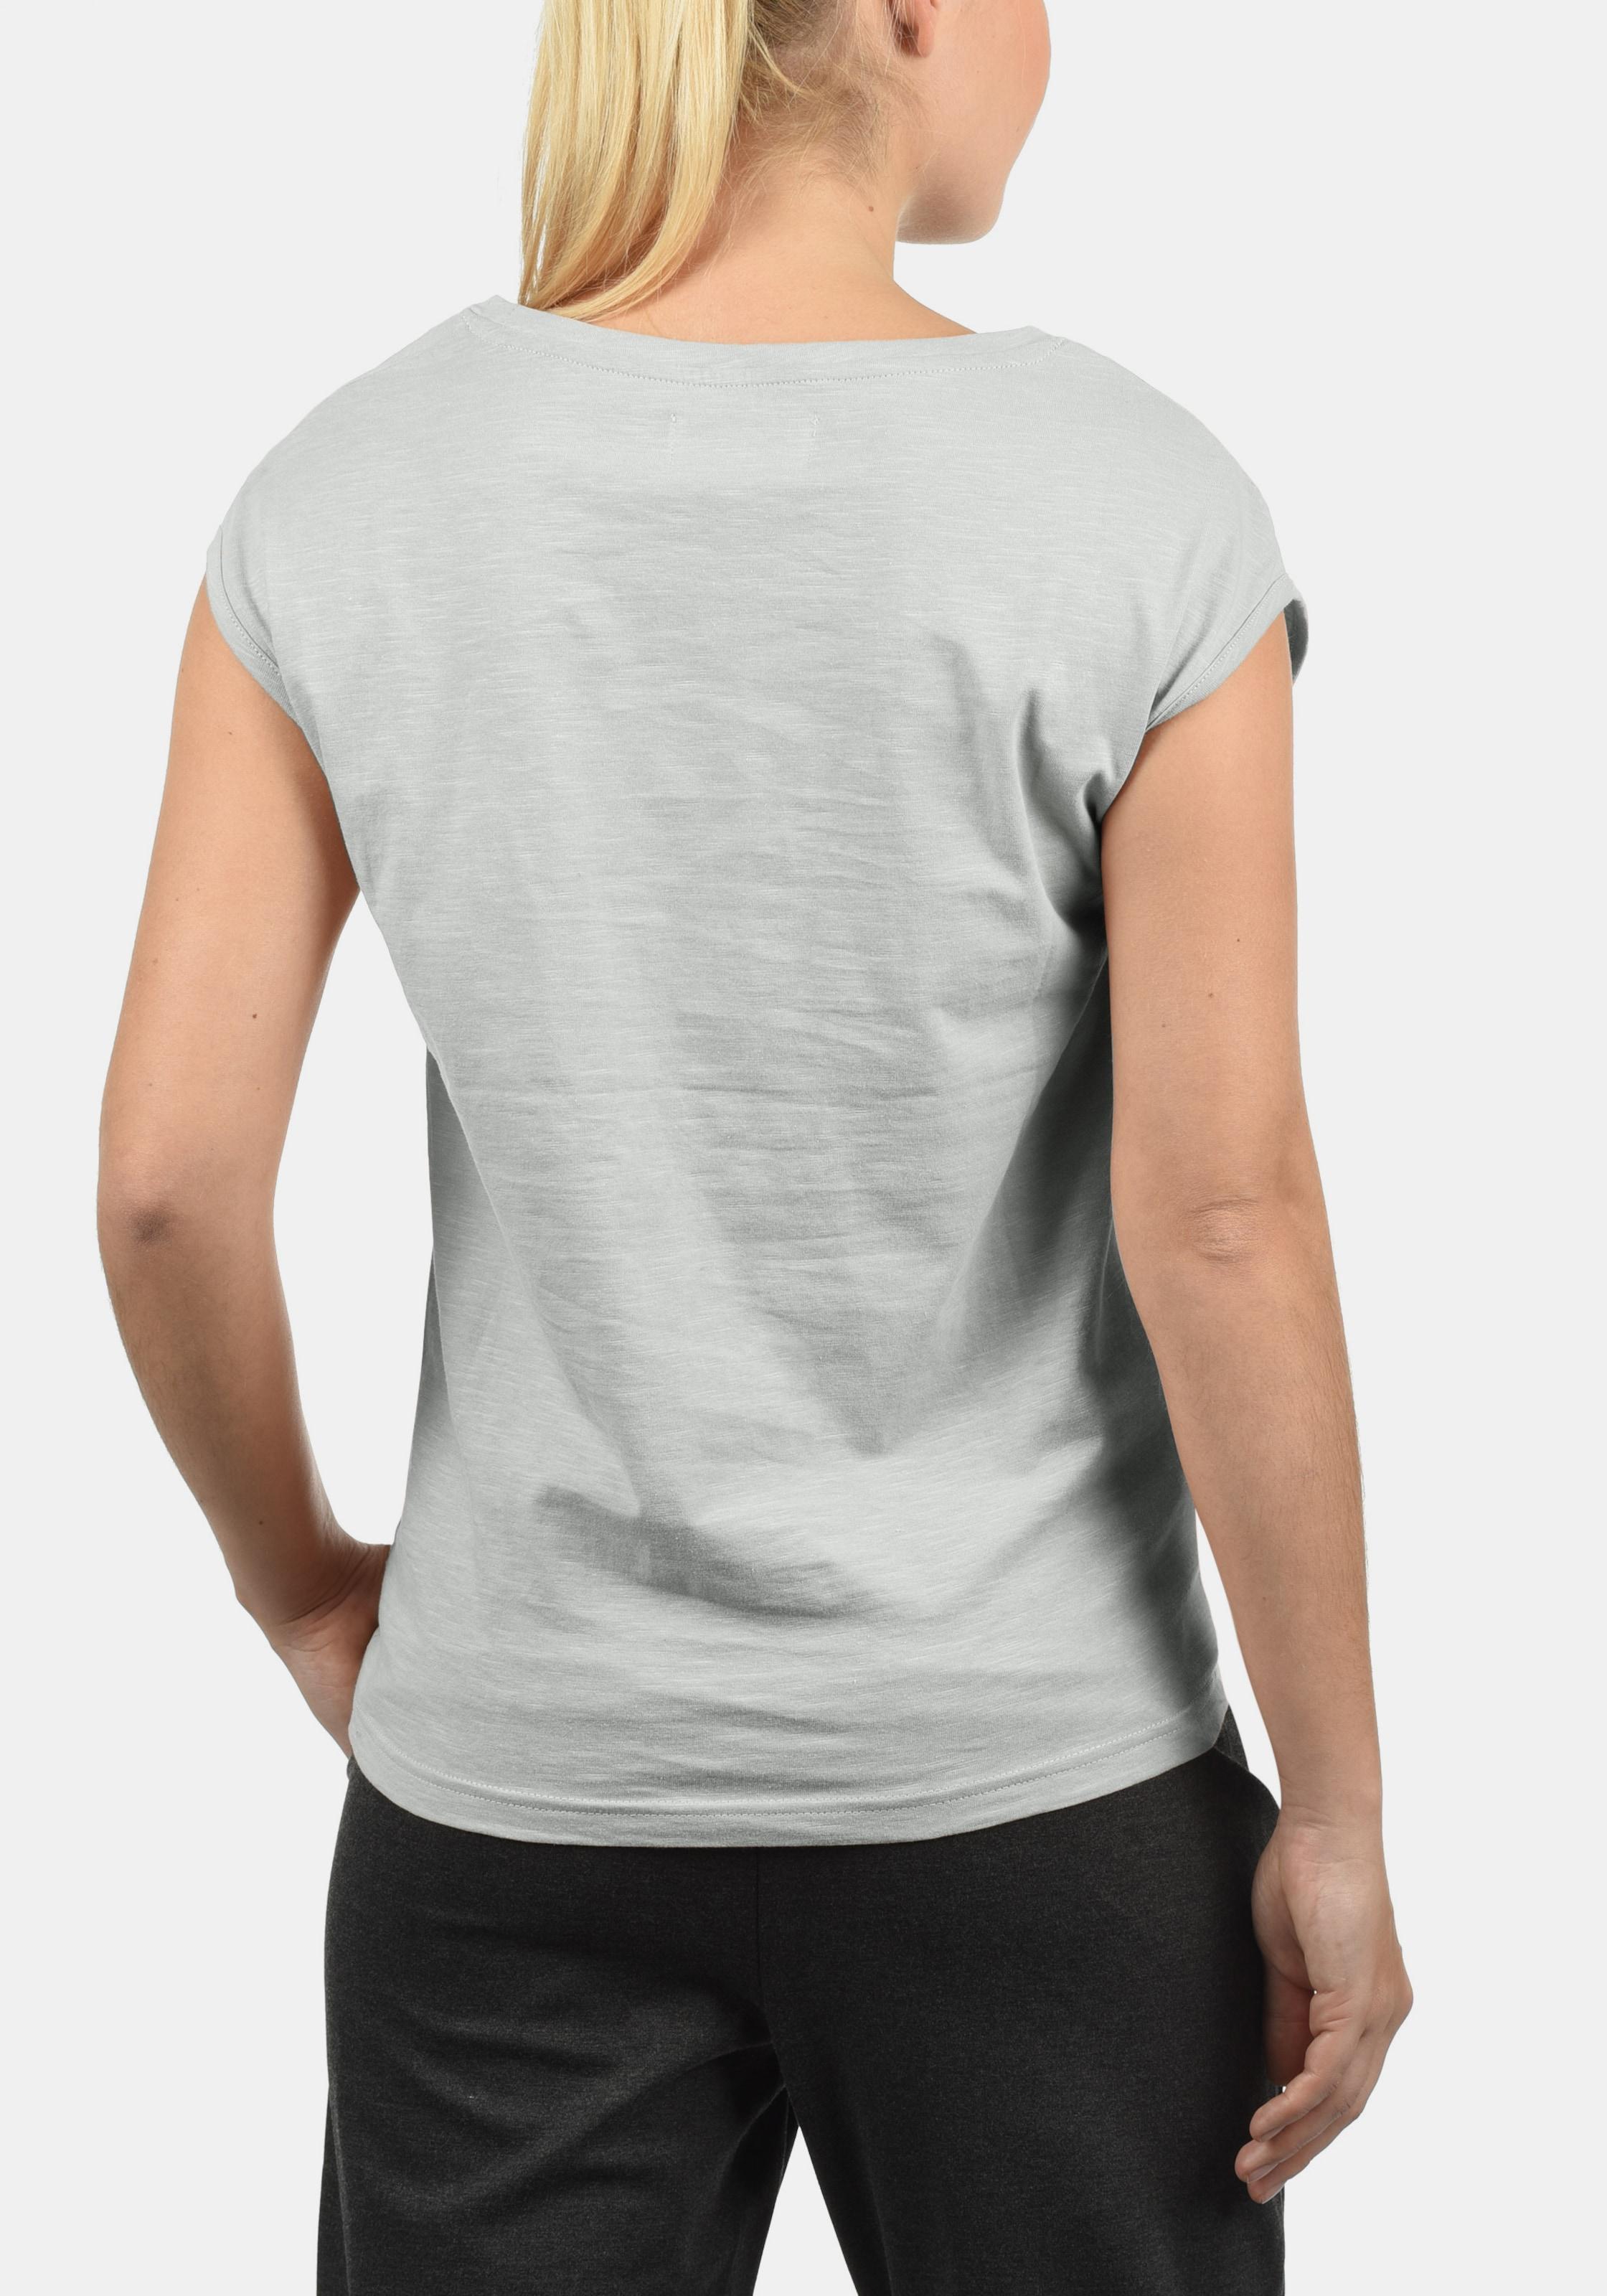 T Hellgrau Desires 'lykke' shirt In sBthxordCQ